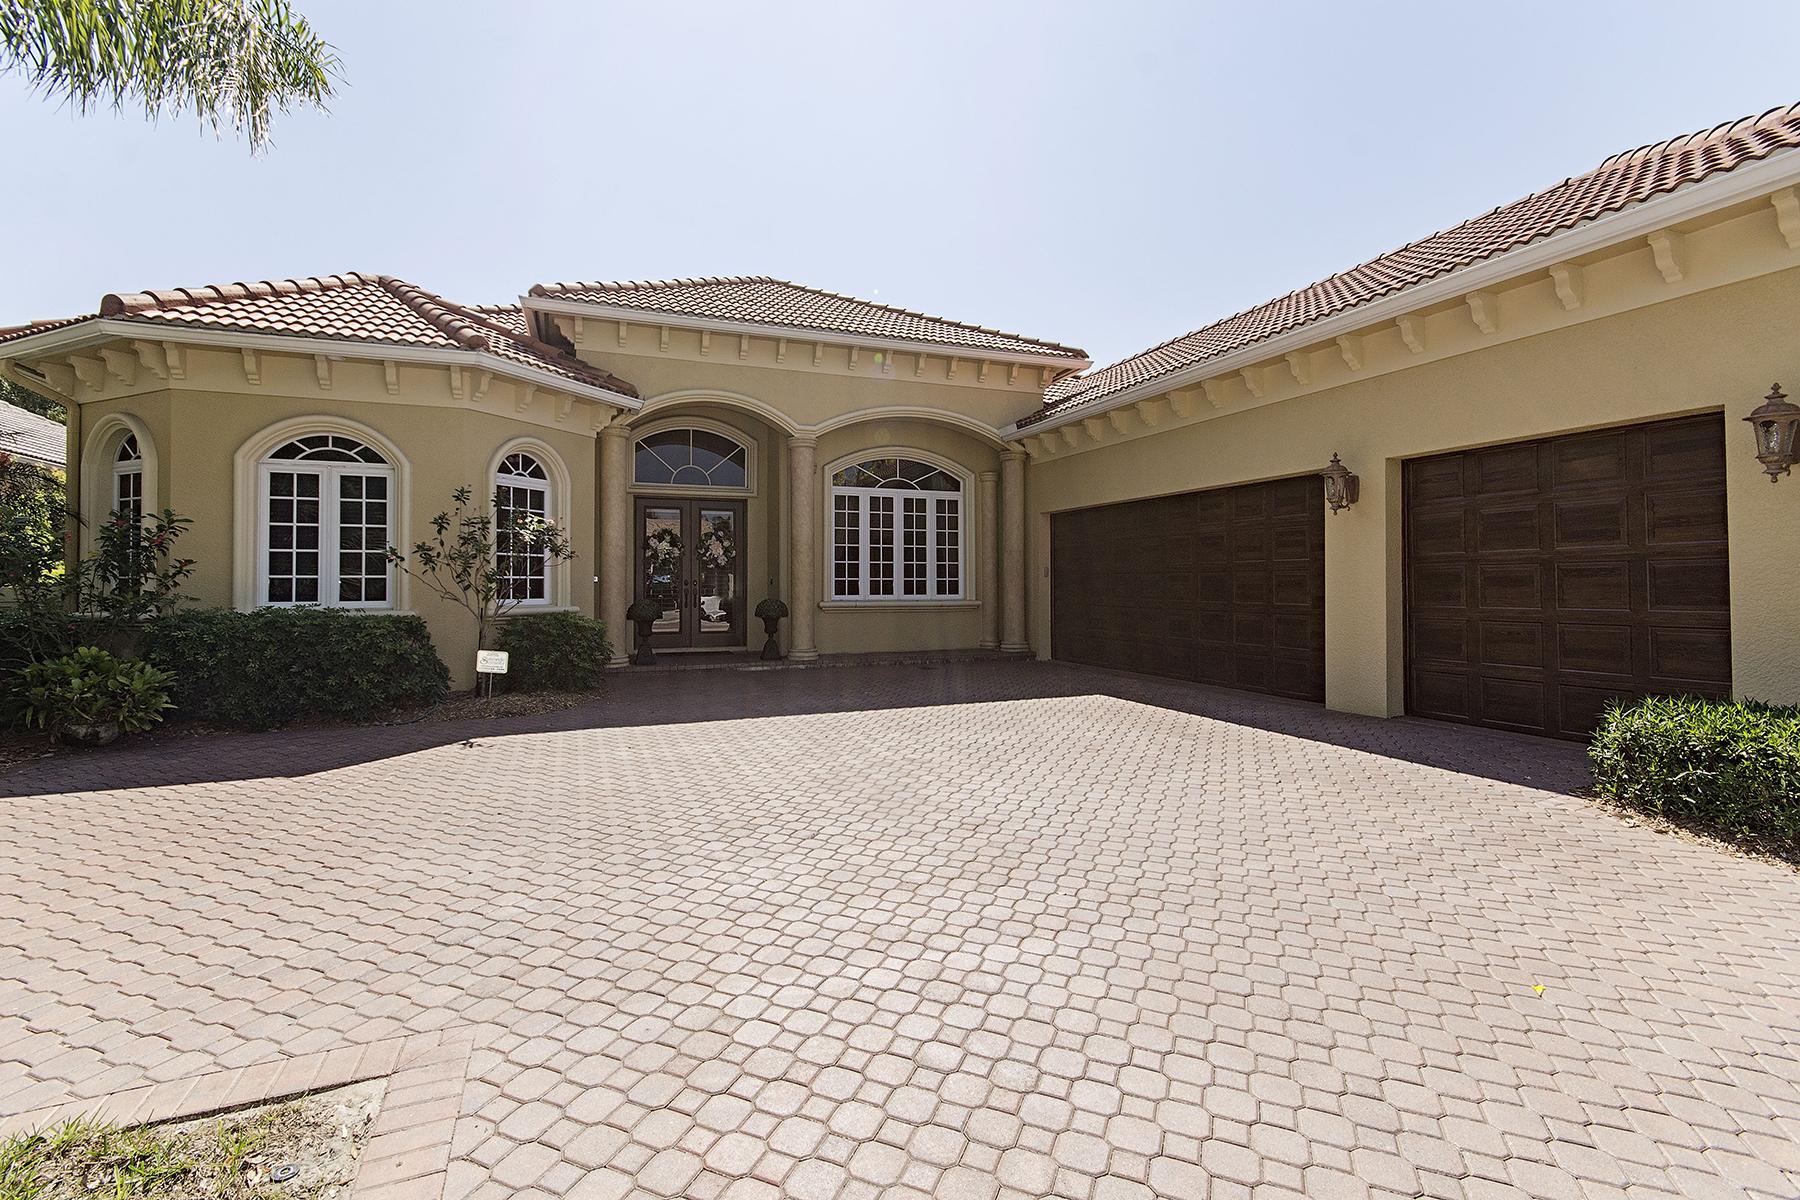 Casa Unifamiliar por un Venta en THE STRAND 5939 Barclay Ln Naples, Florida 34110 Estados Unidos